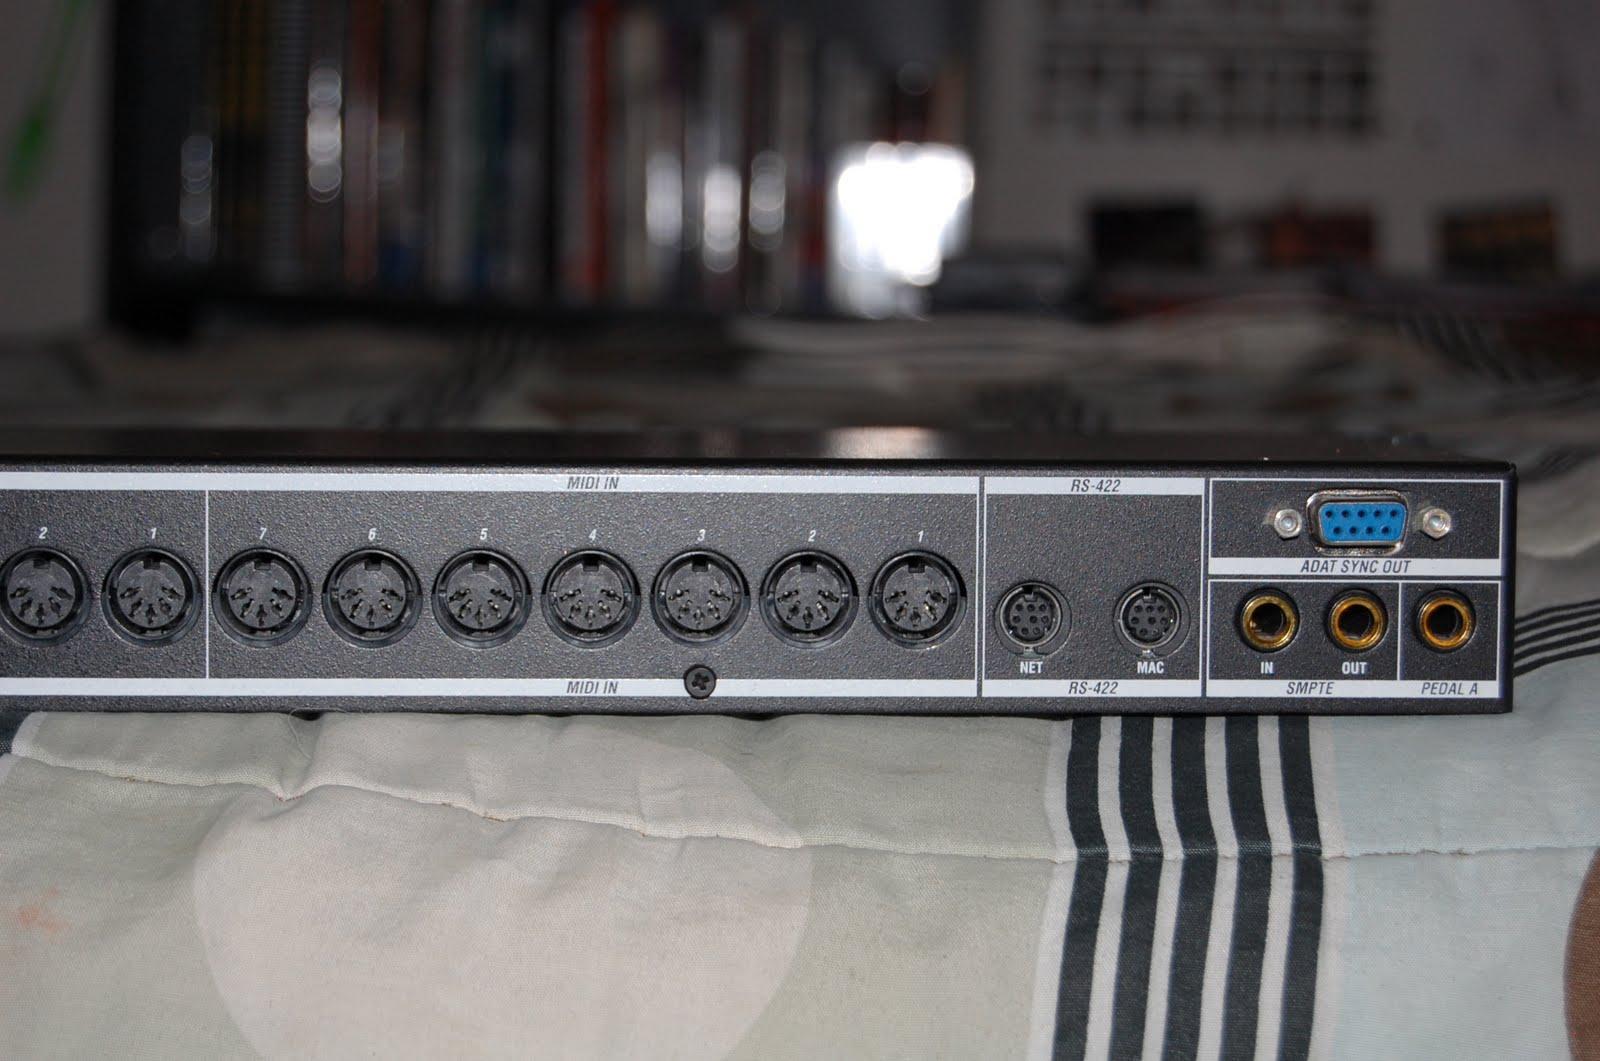 MATRIXSYNTH-B: MOTU MIDI Timepiece 8x8 MIDI Interface (USB